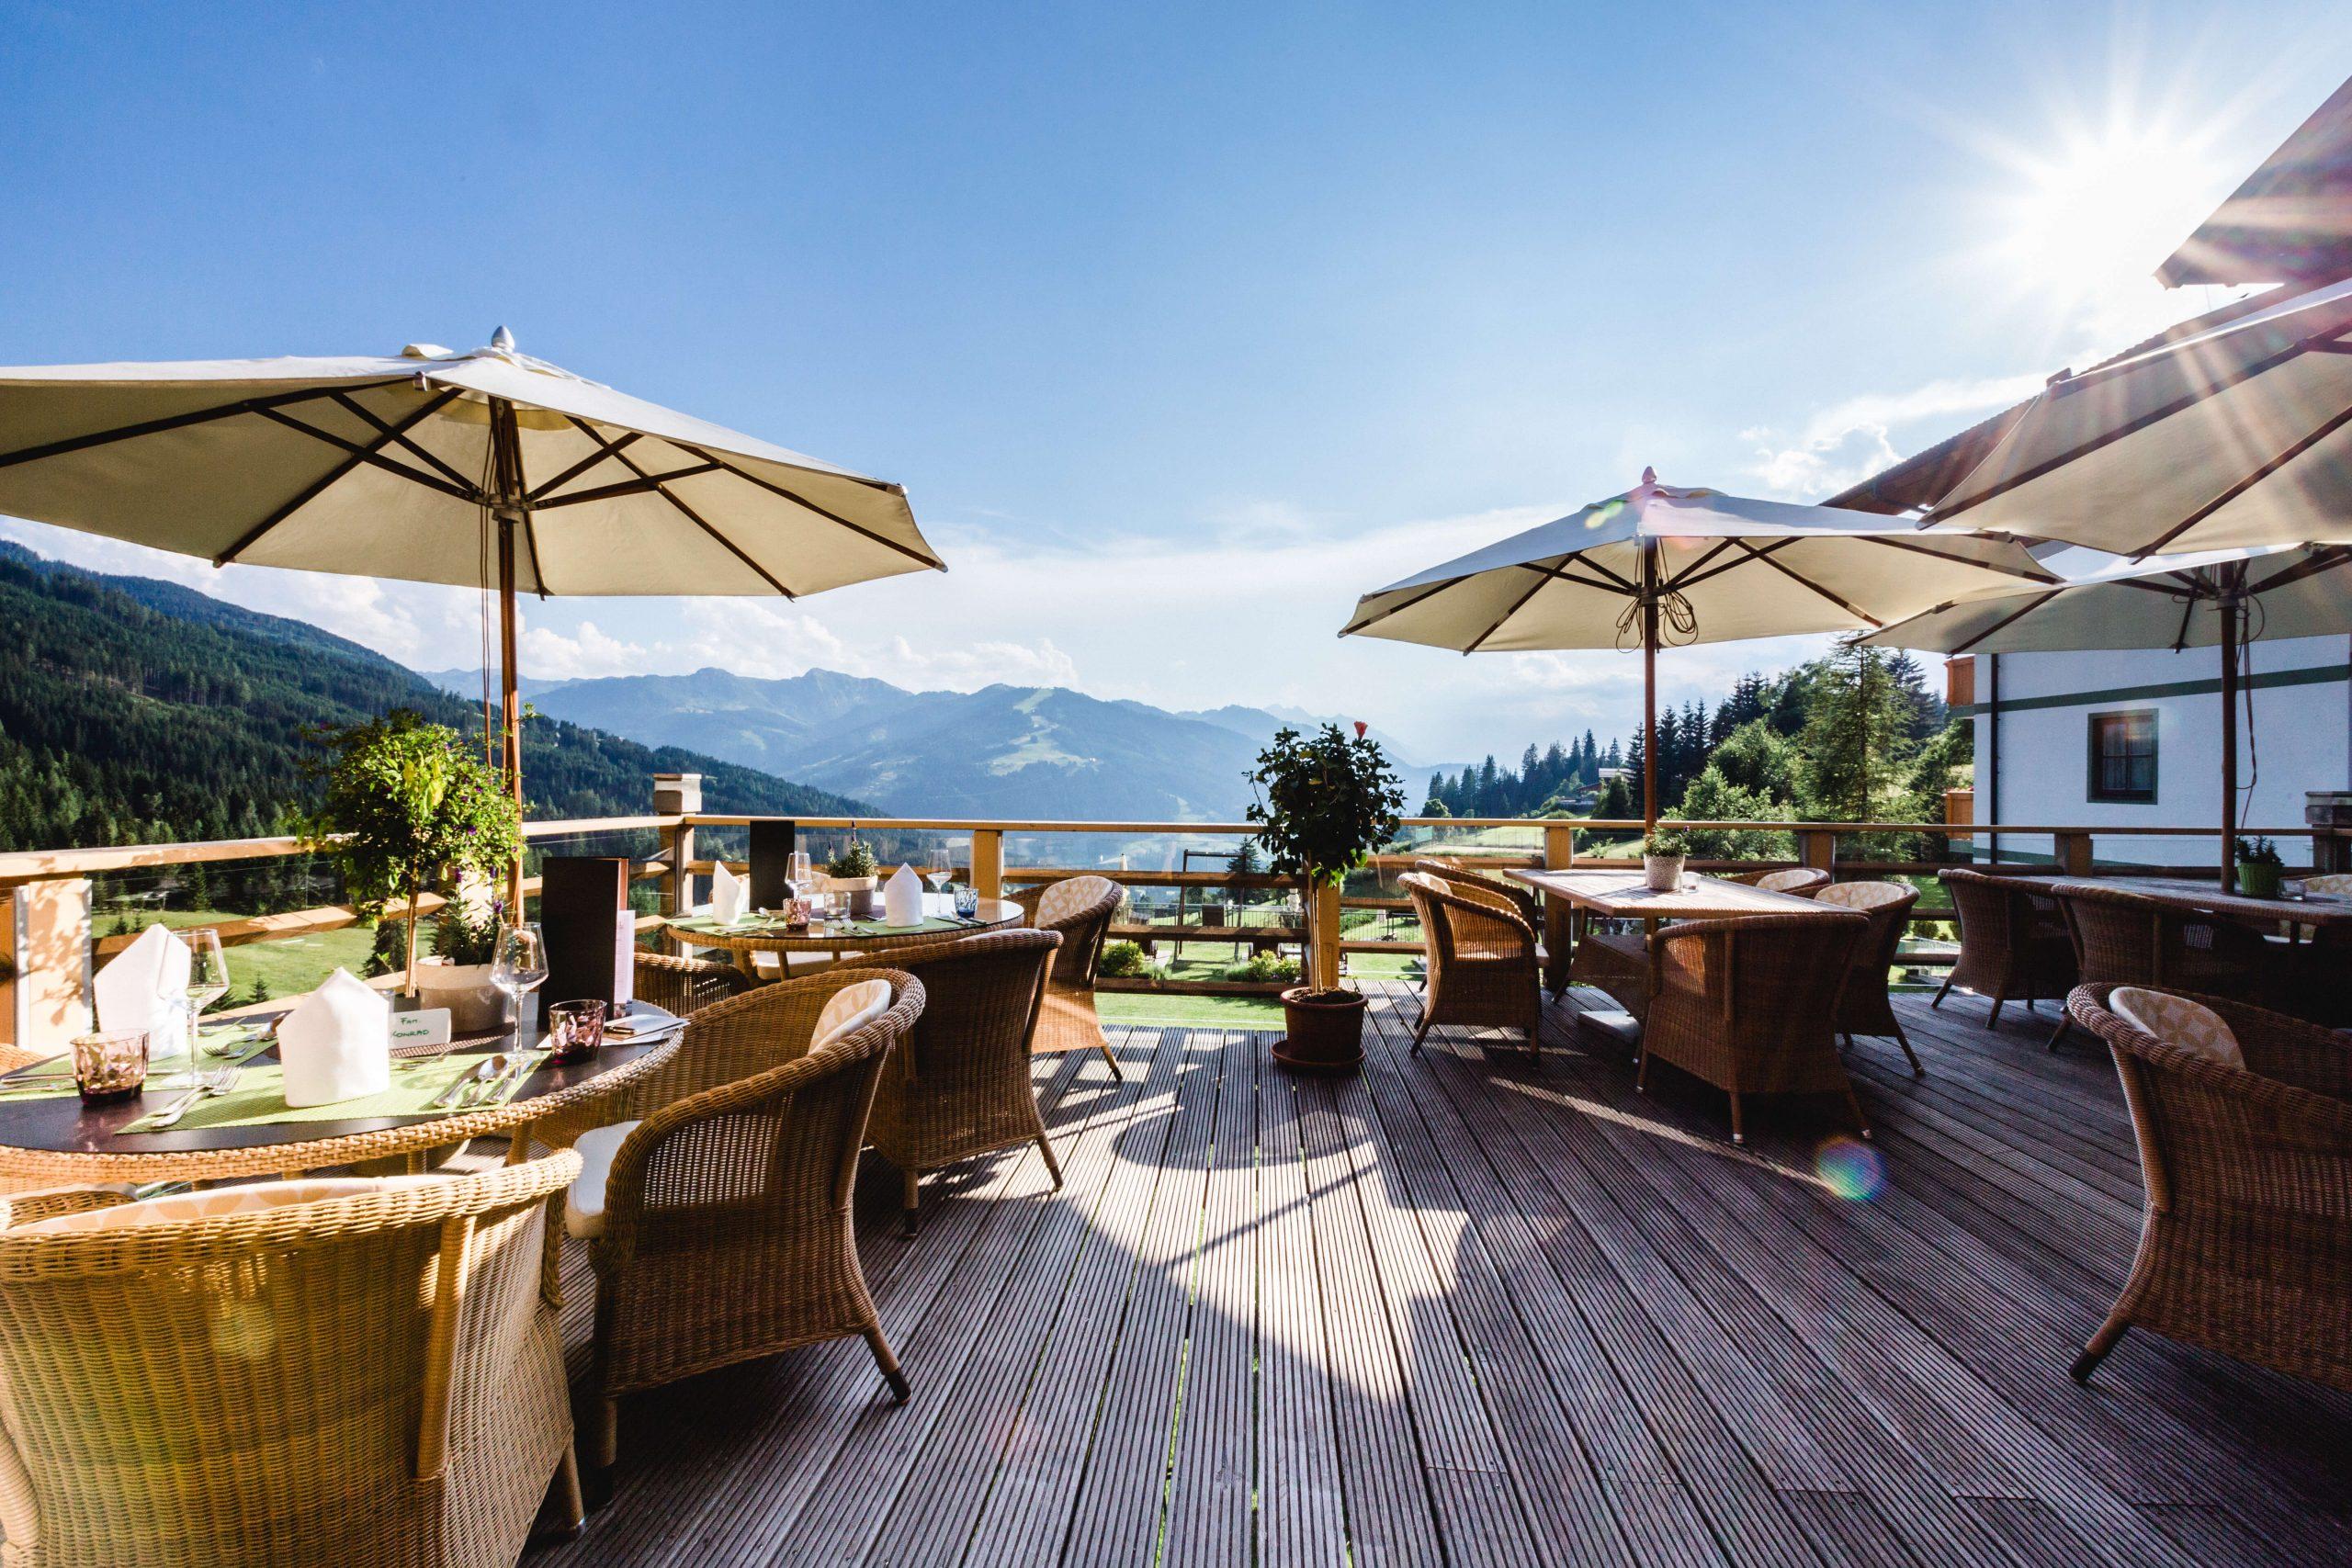 Sonnenterrasse im Naturidyll Hotel Edelweiss Wagrain